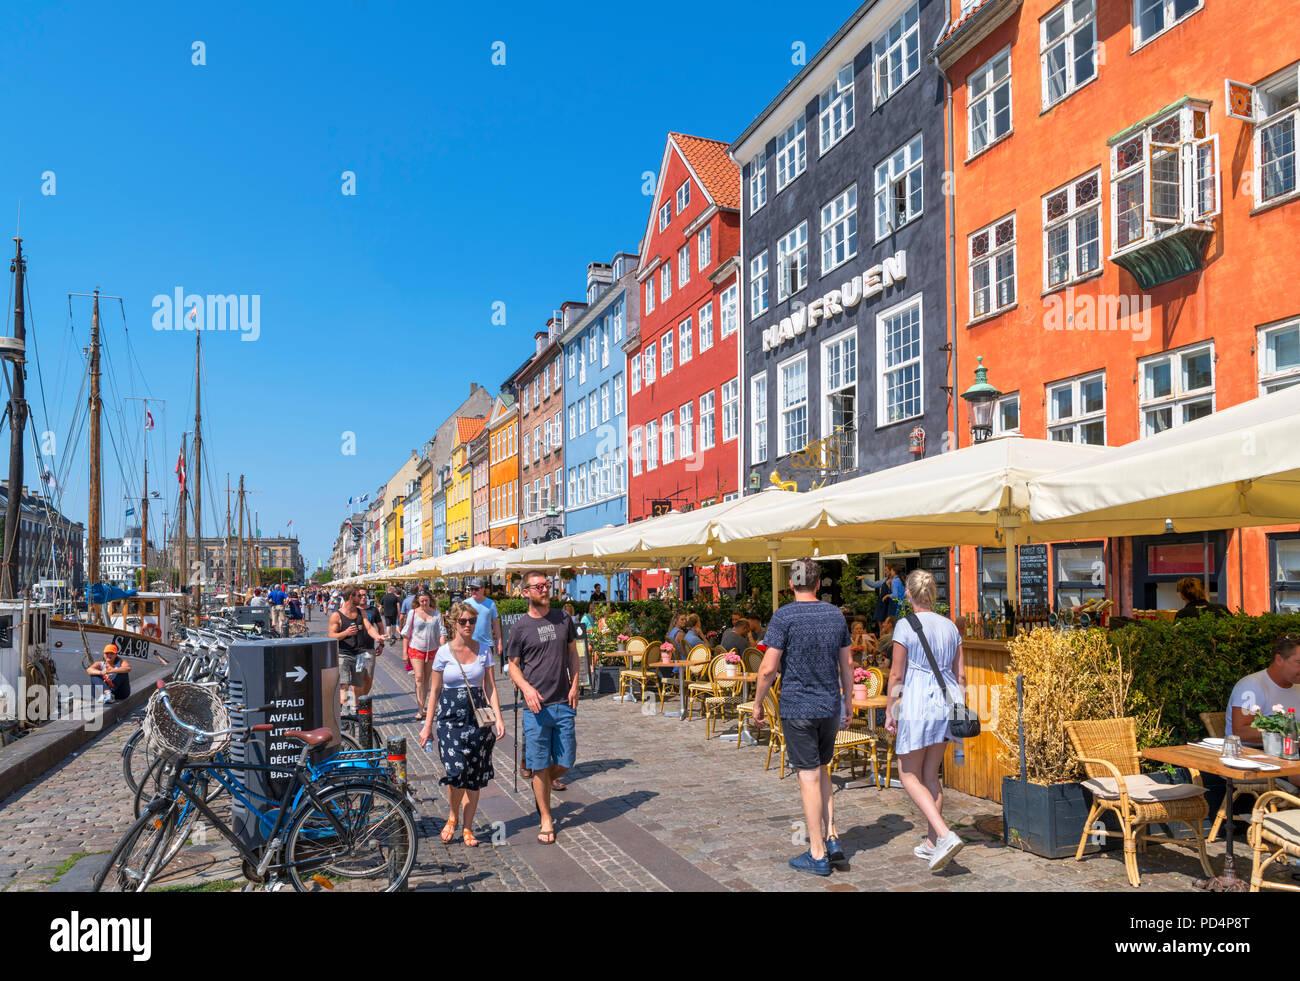 Nyhavn, Kopenhagen. Cafés, Bars und Restaurants entlang der historischen Nyhavn-kanal, Kopenhagen, Dänemark Stockbild